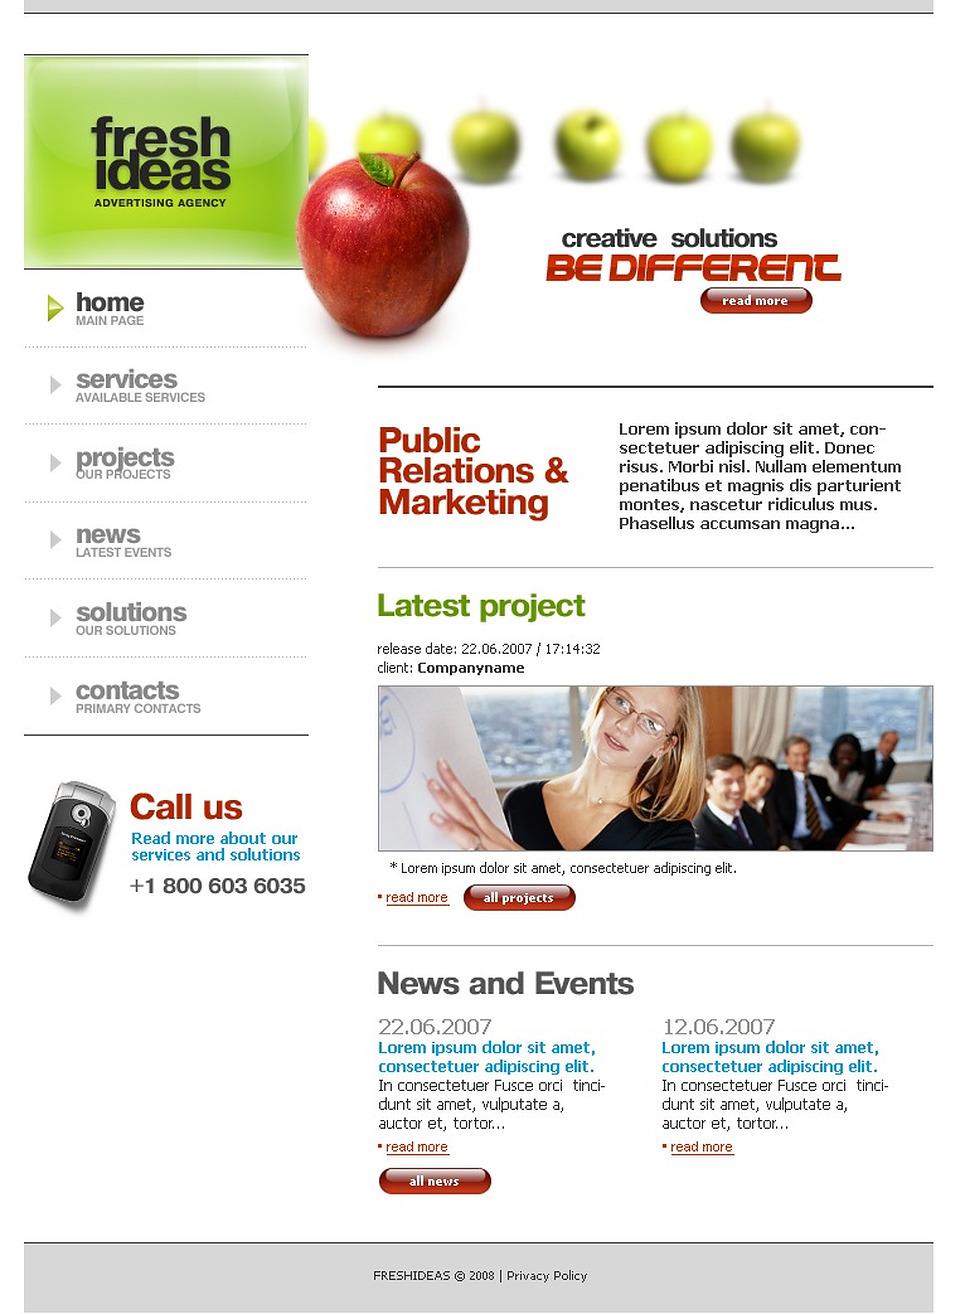 advertising agency website template 18918. Black Bedroom Furniture Sets. Home Design Ideas